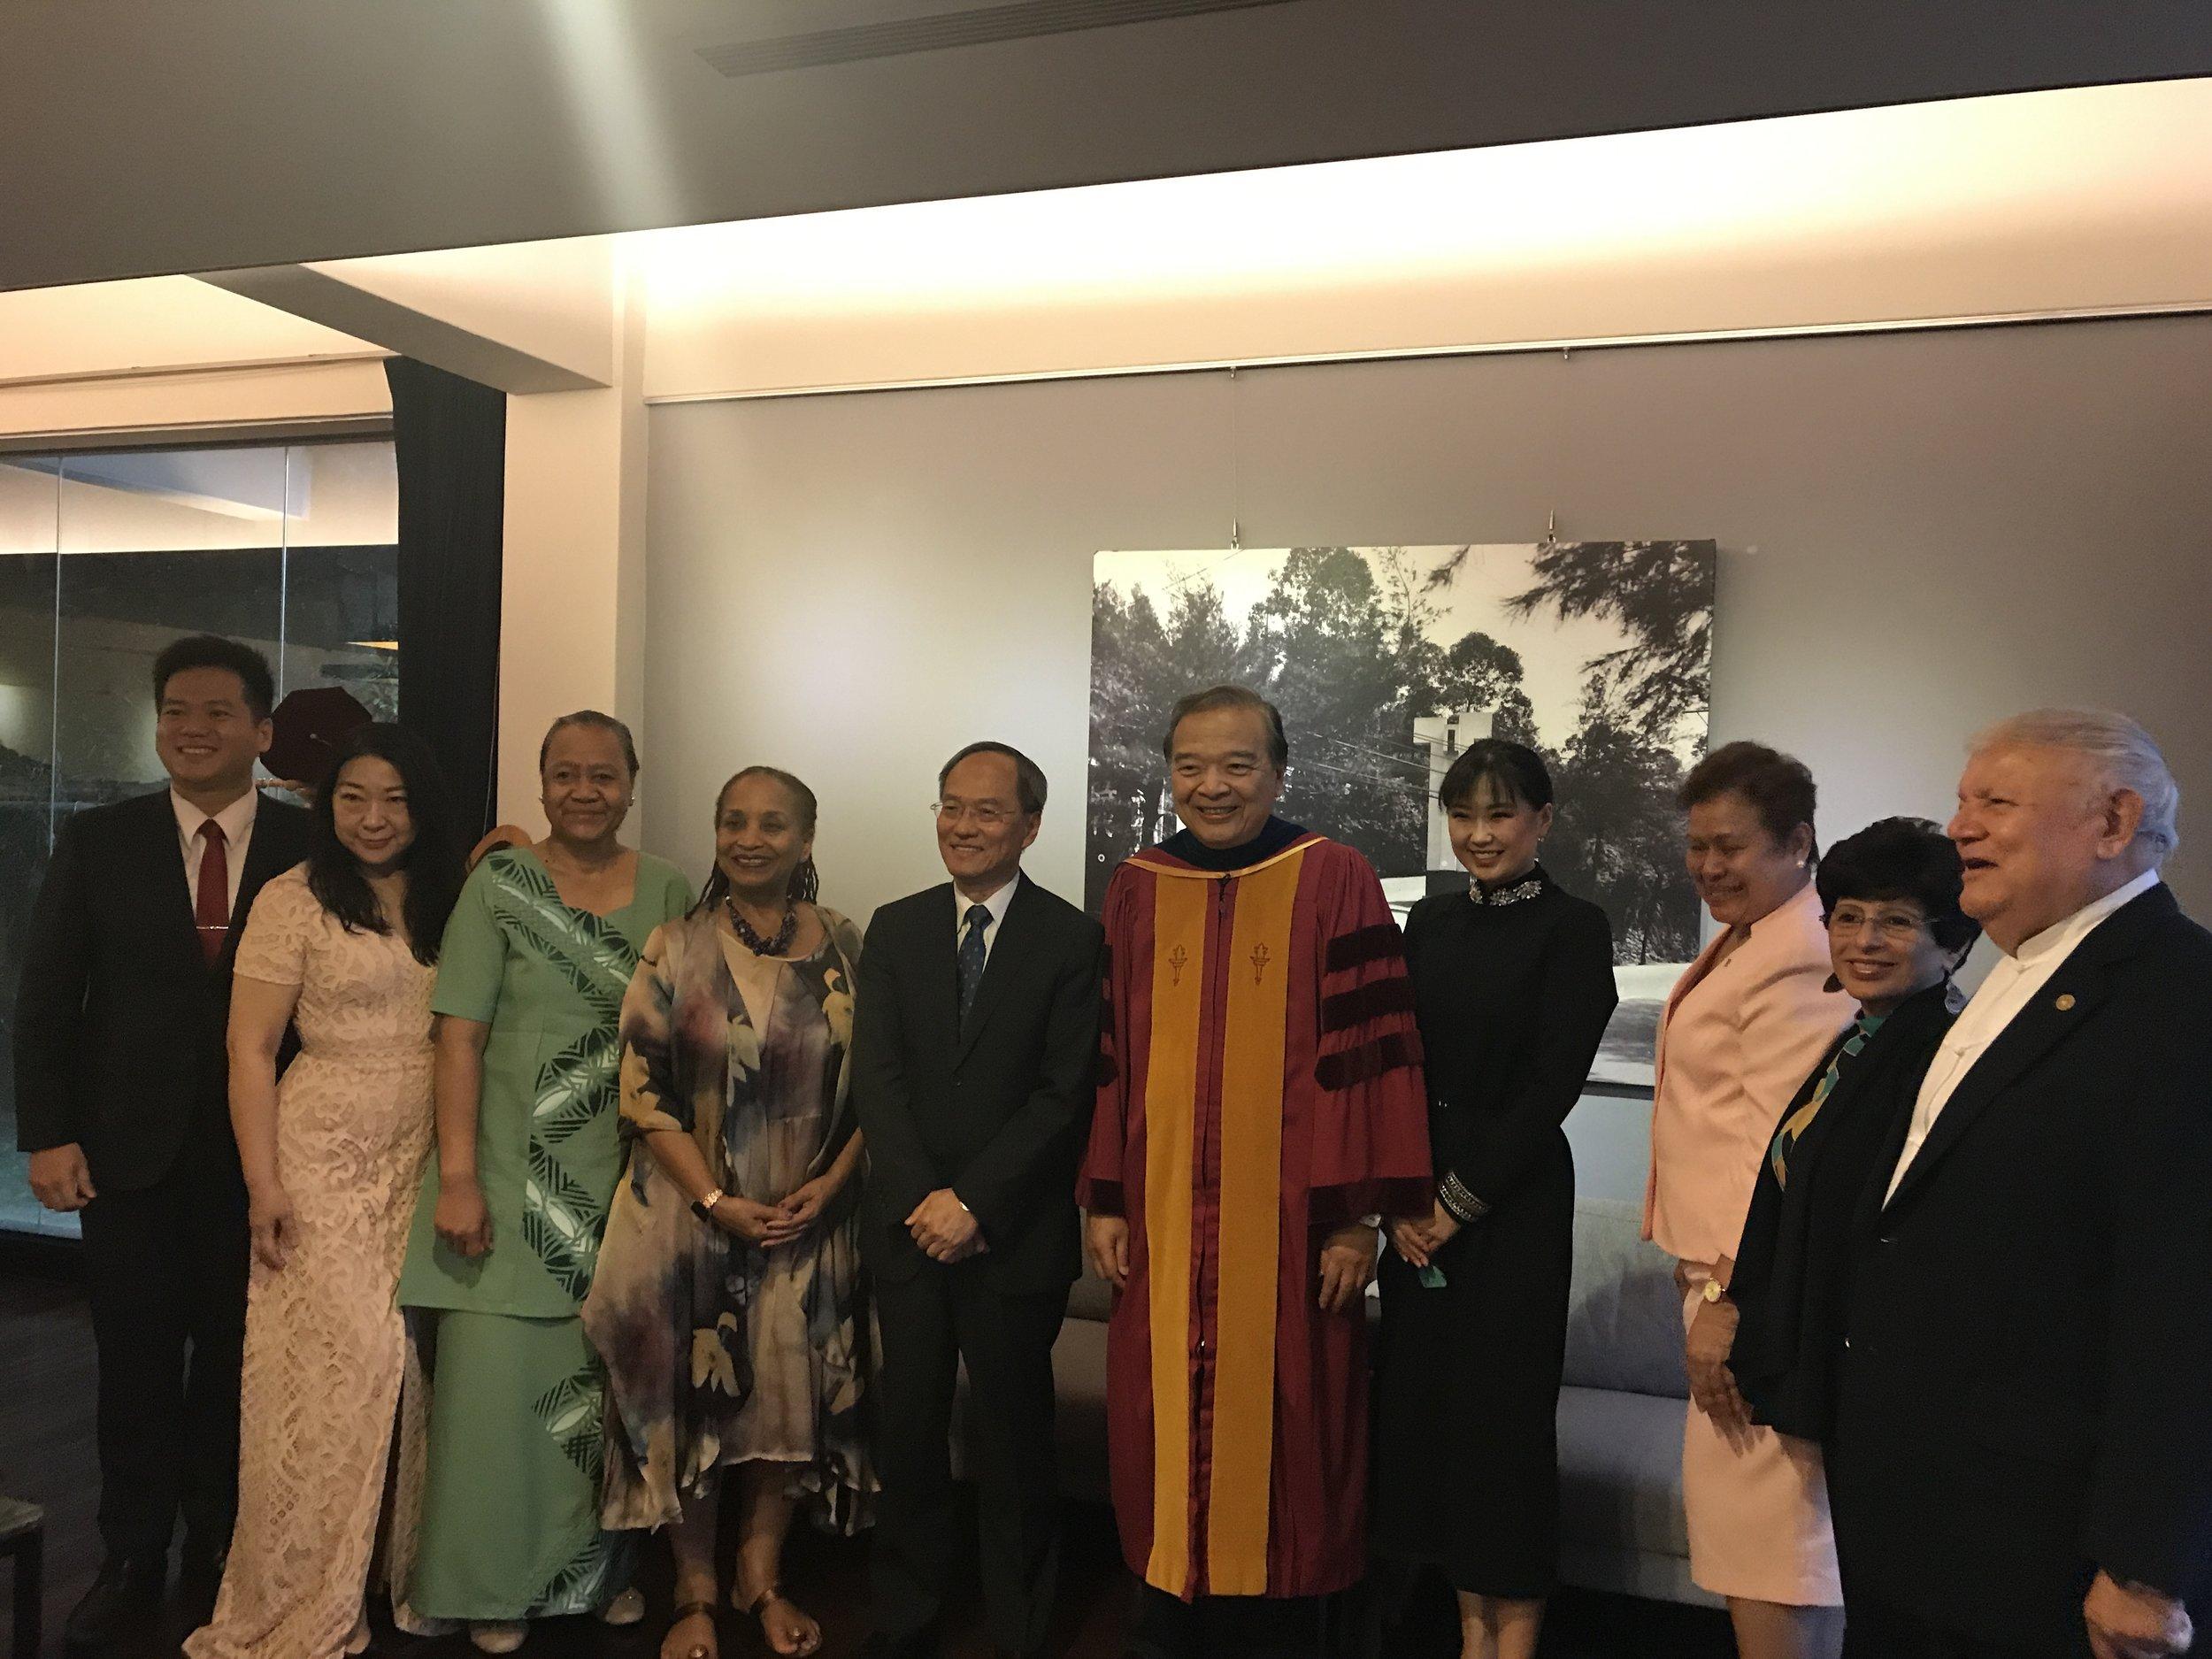 H.E. Ambassador Teatu with President Dr. Chuan Lee